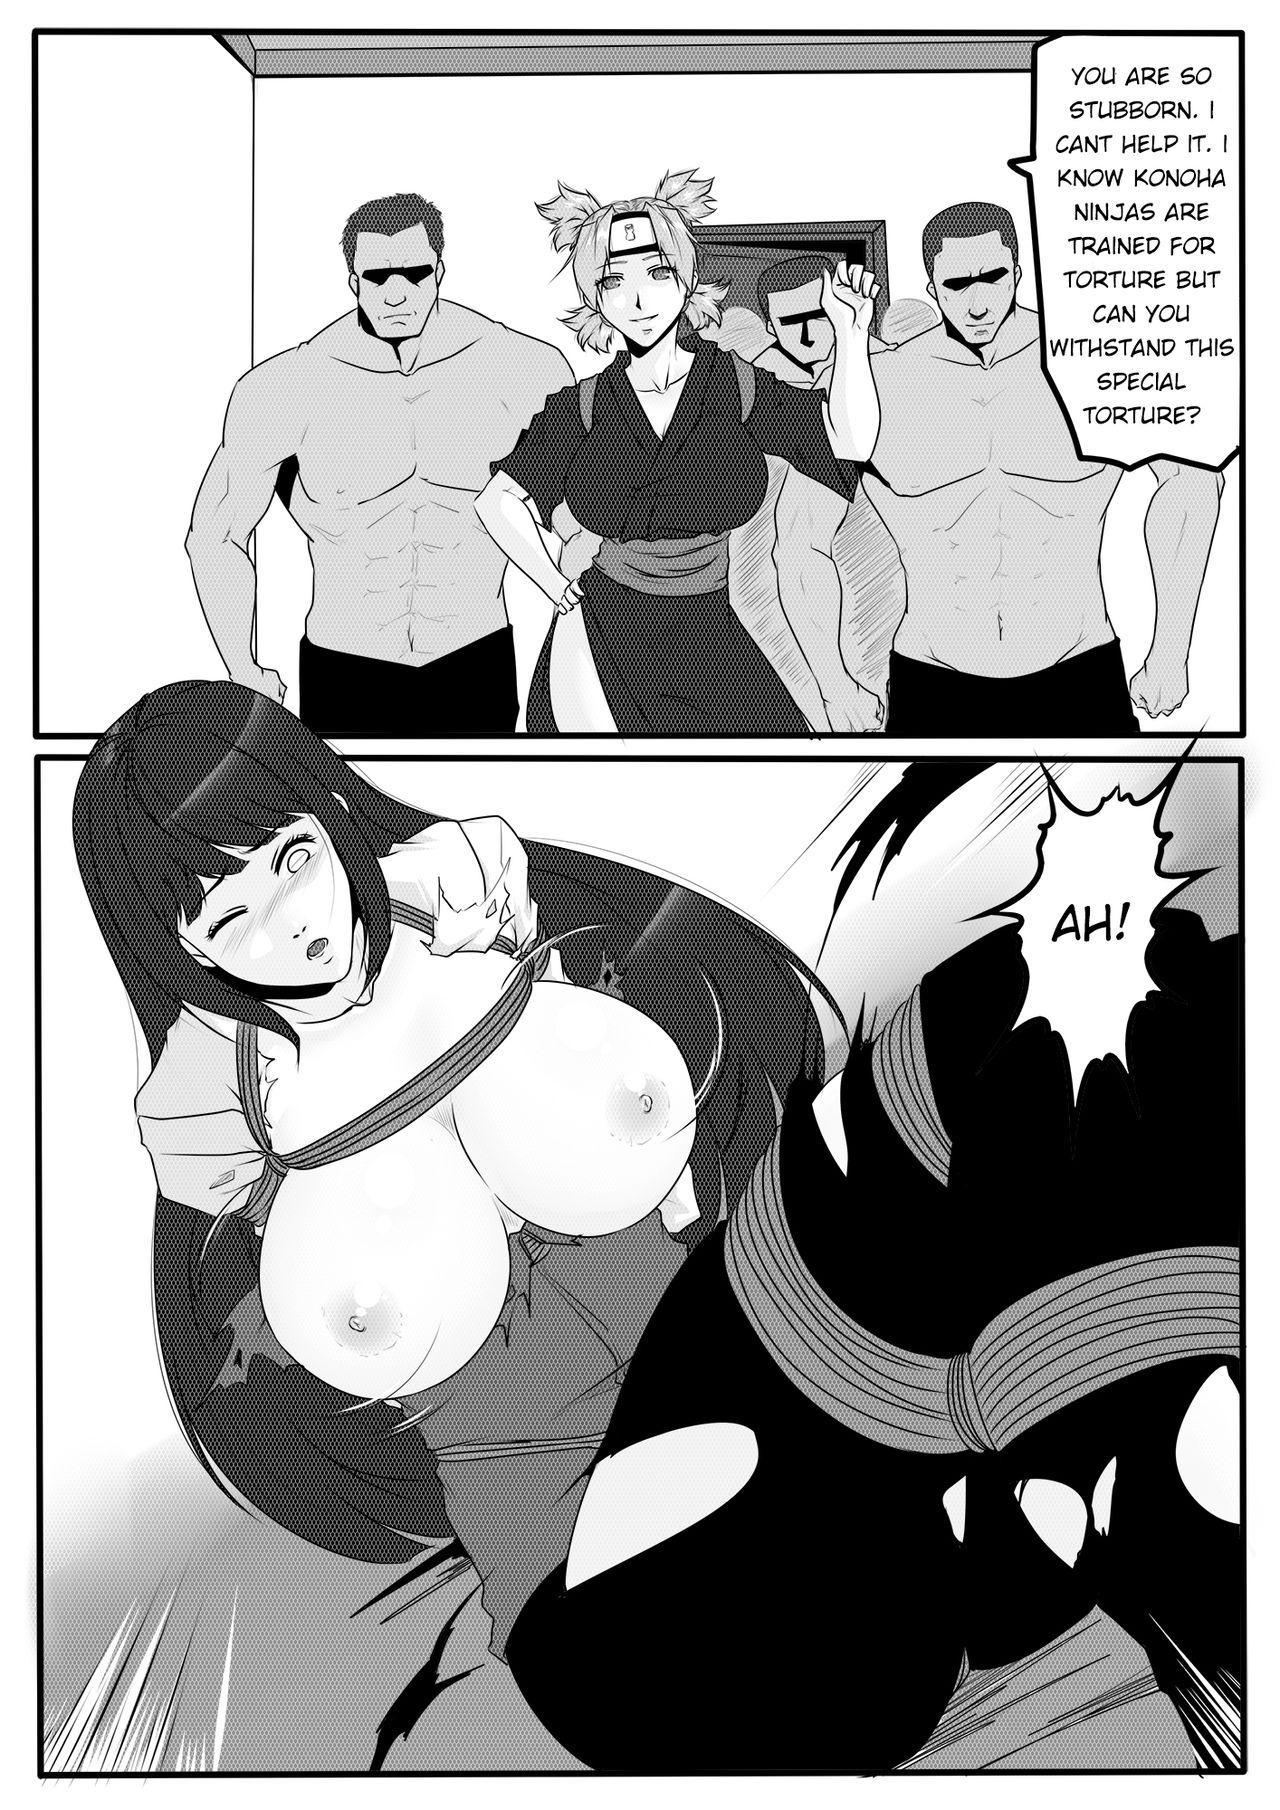 [GoDLeTTeR] Kunoichi Jigoku Daisanmaku (Naruto) ENG 16